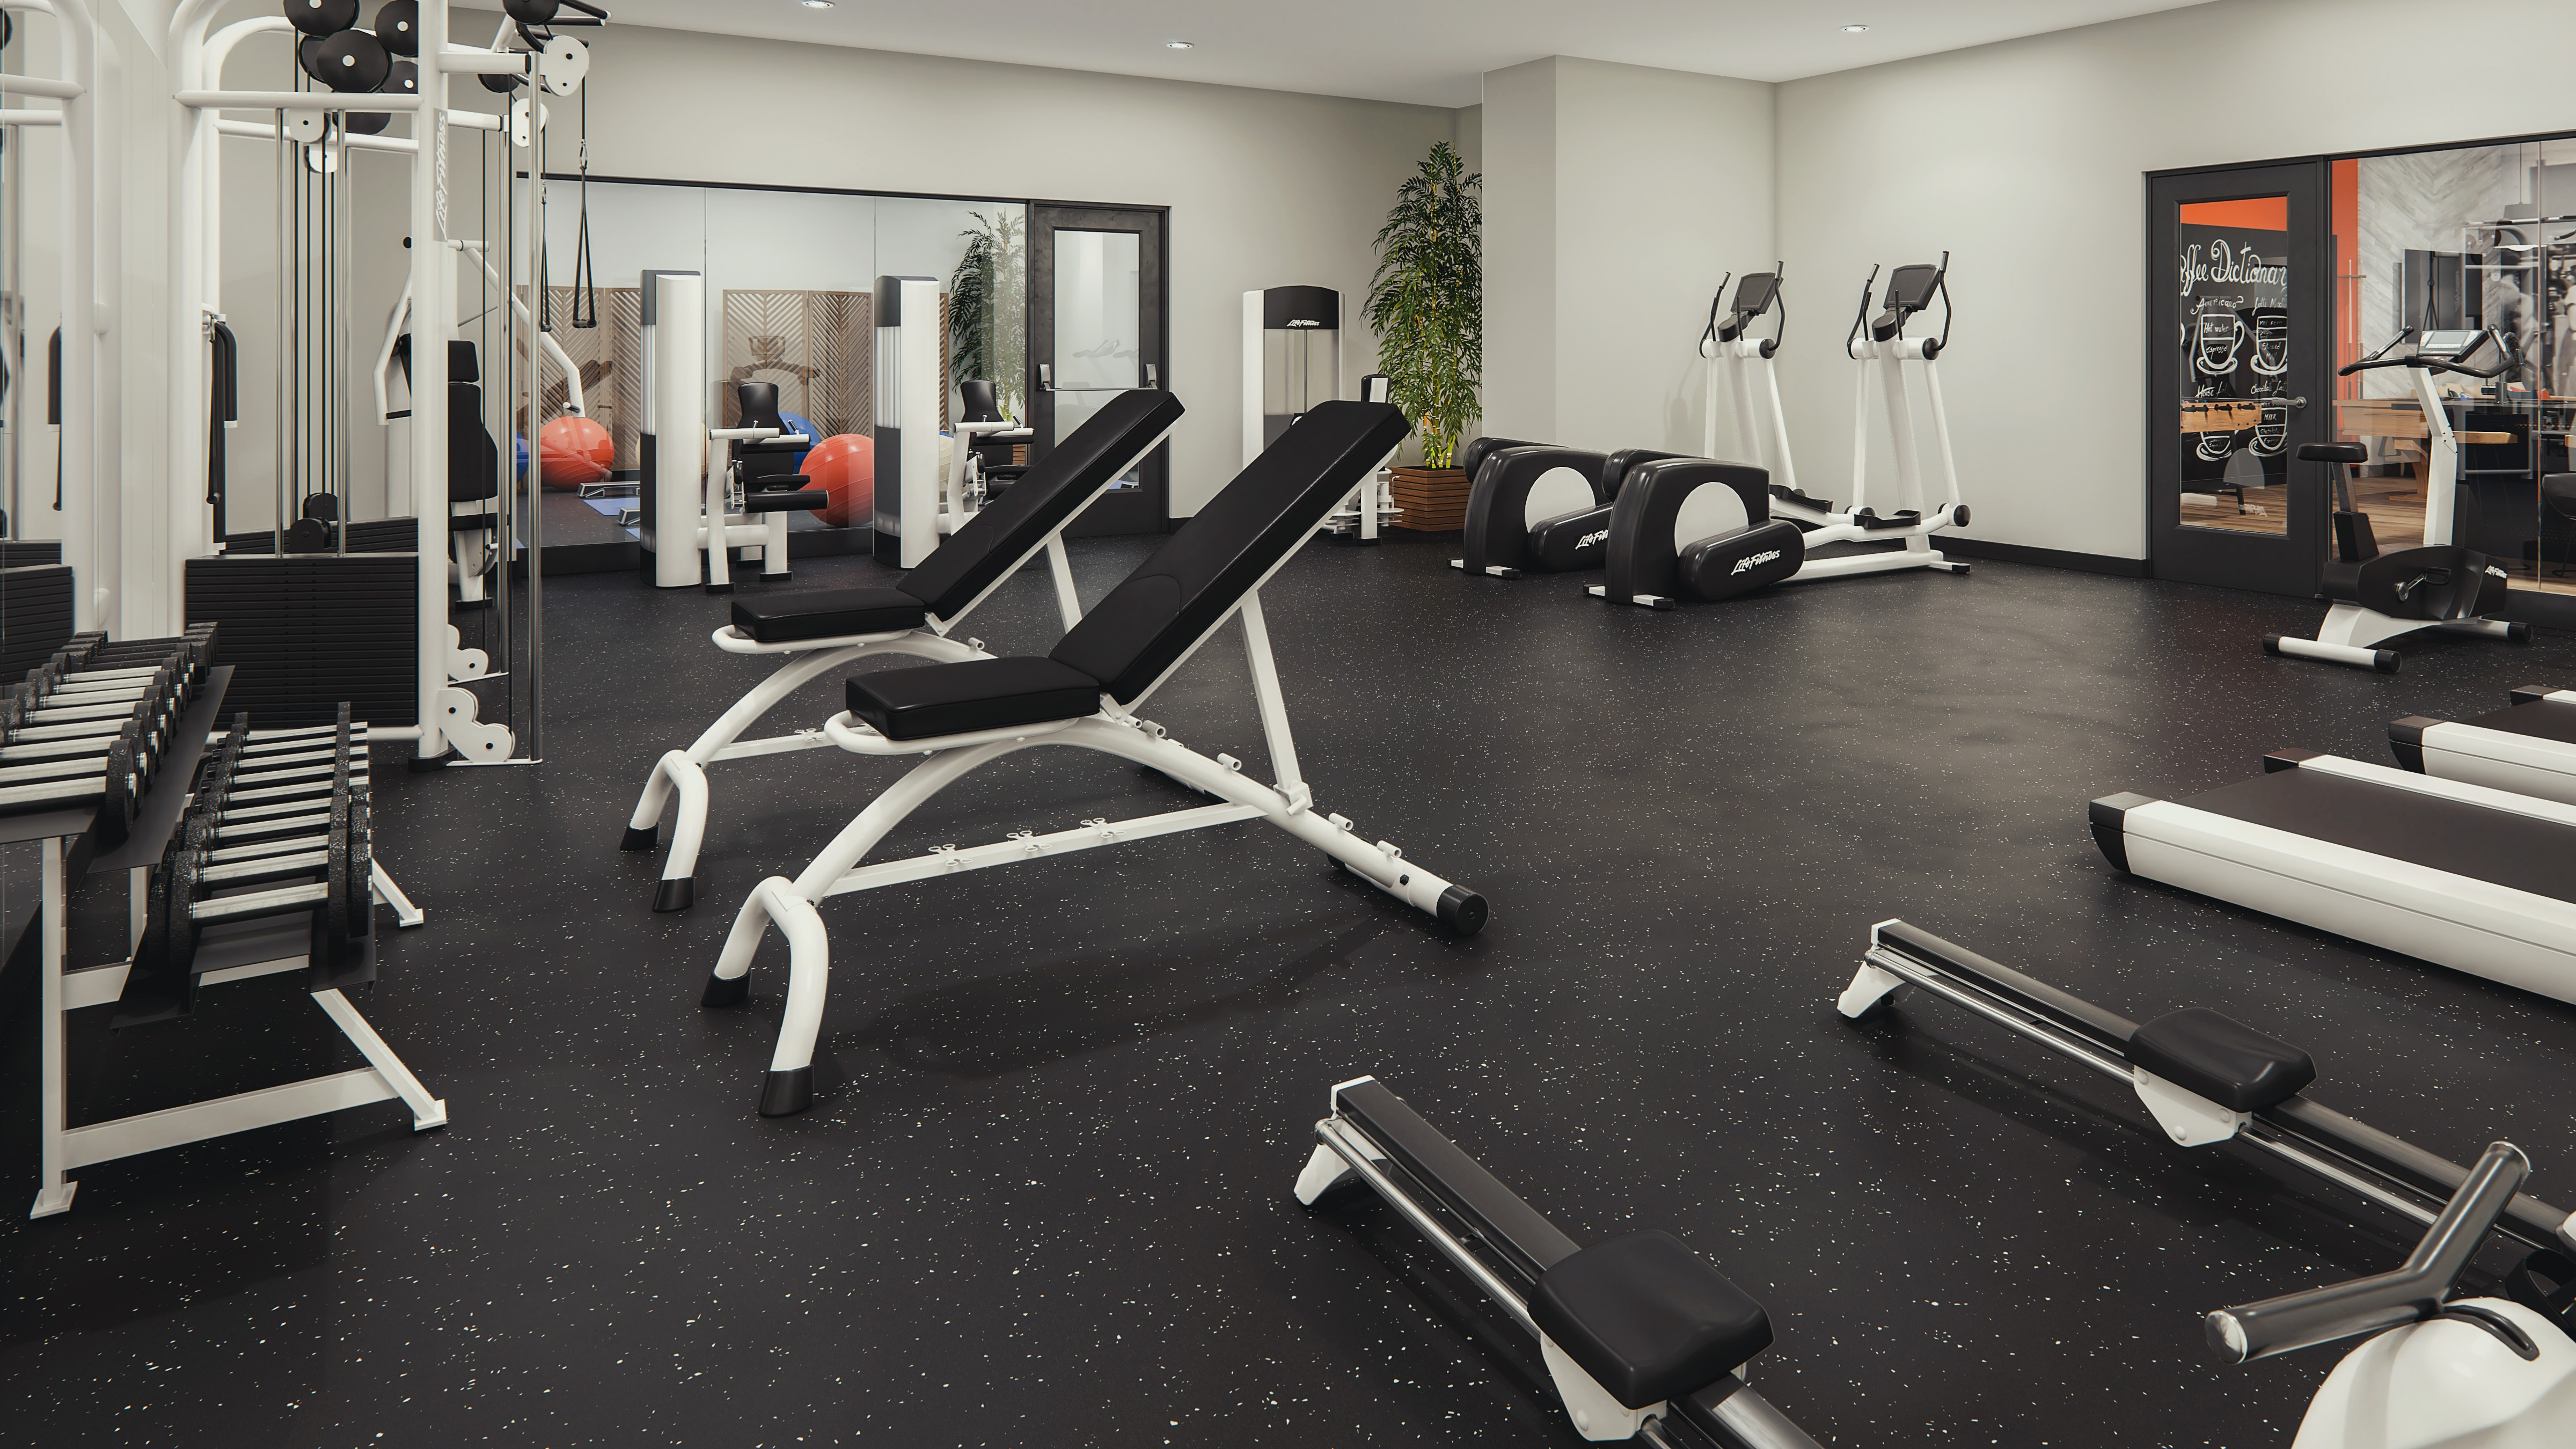 Rendering of gym facilities. Dumb bell rack, squat rack and elliptical machines